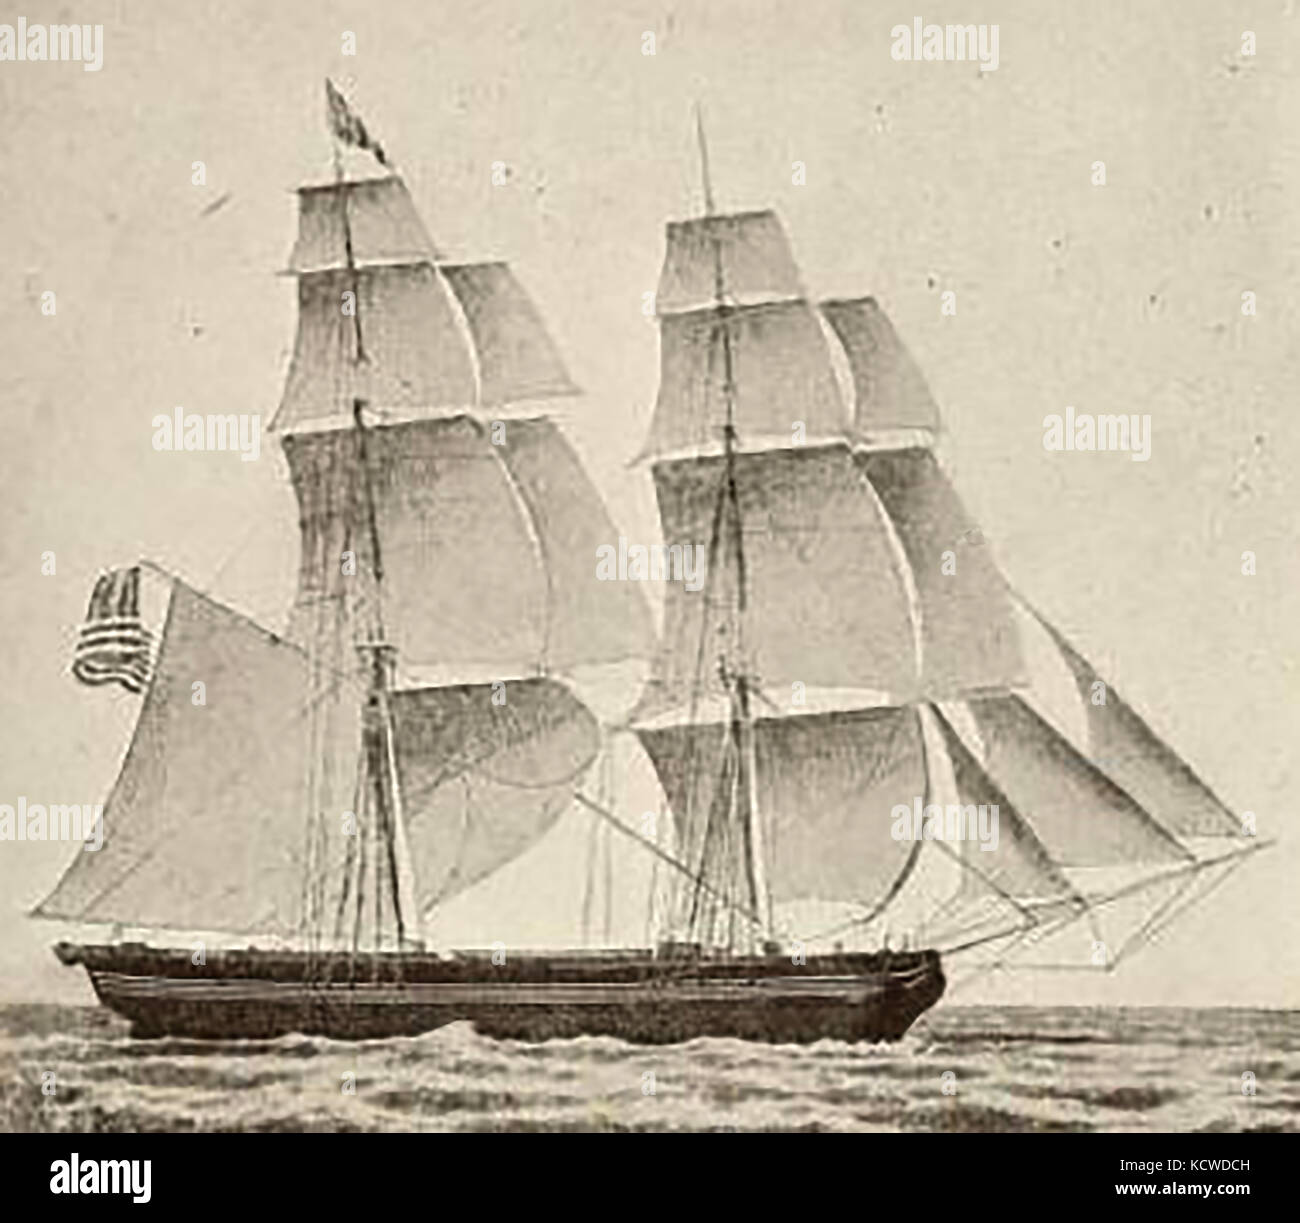 The Boston (USA) ship CZARINA c1835 - Stock Image